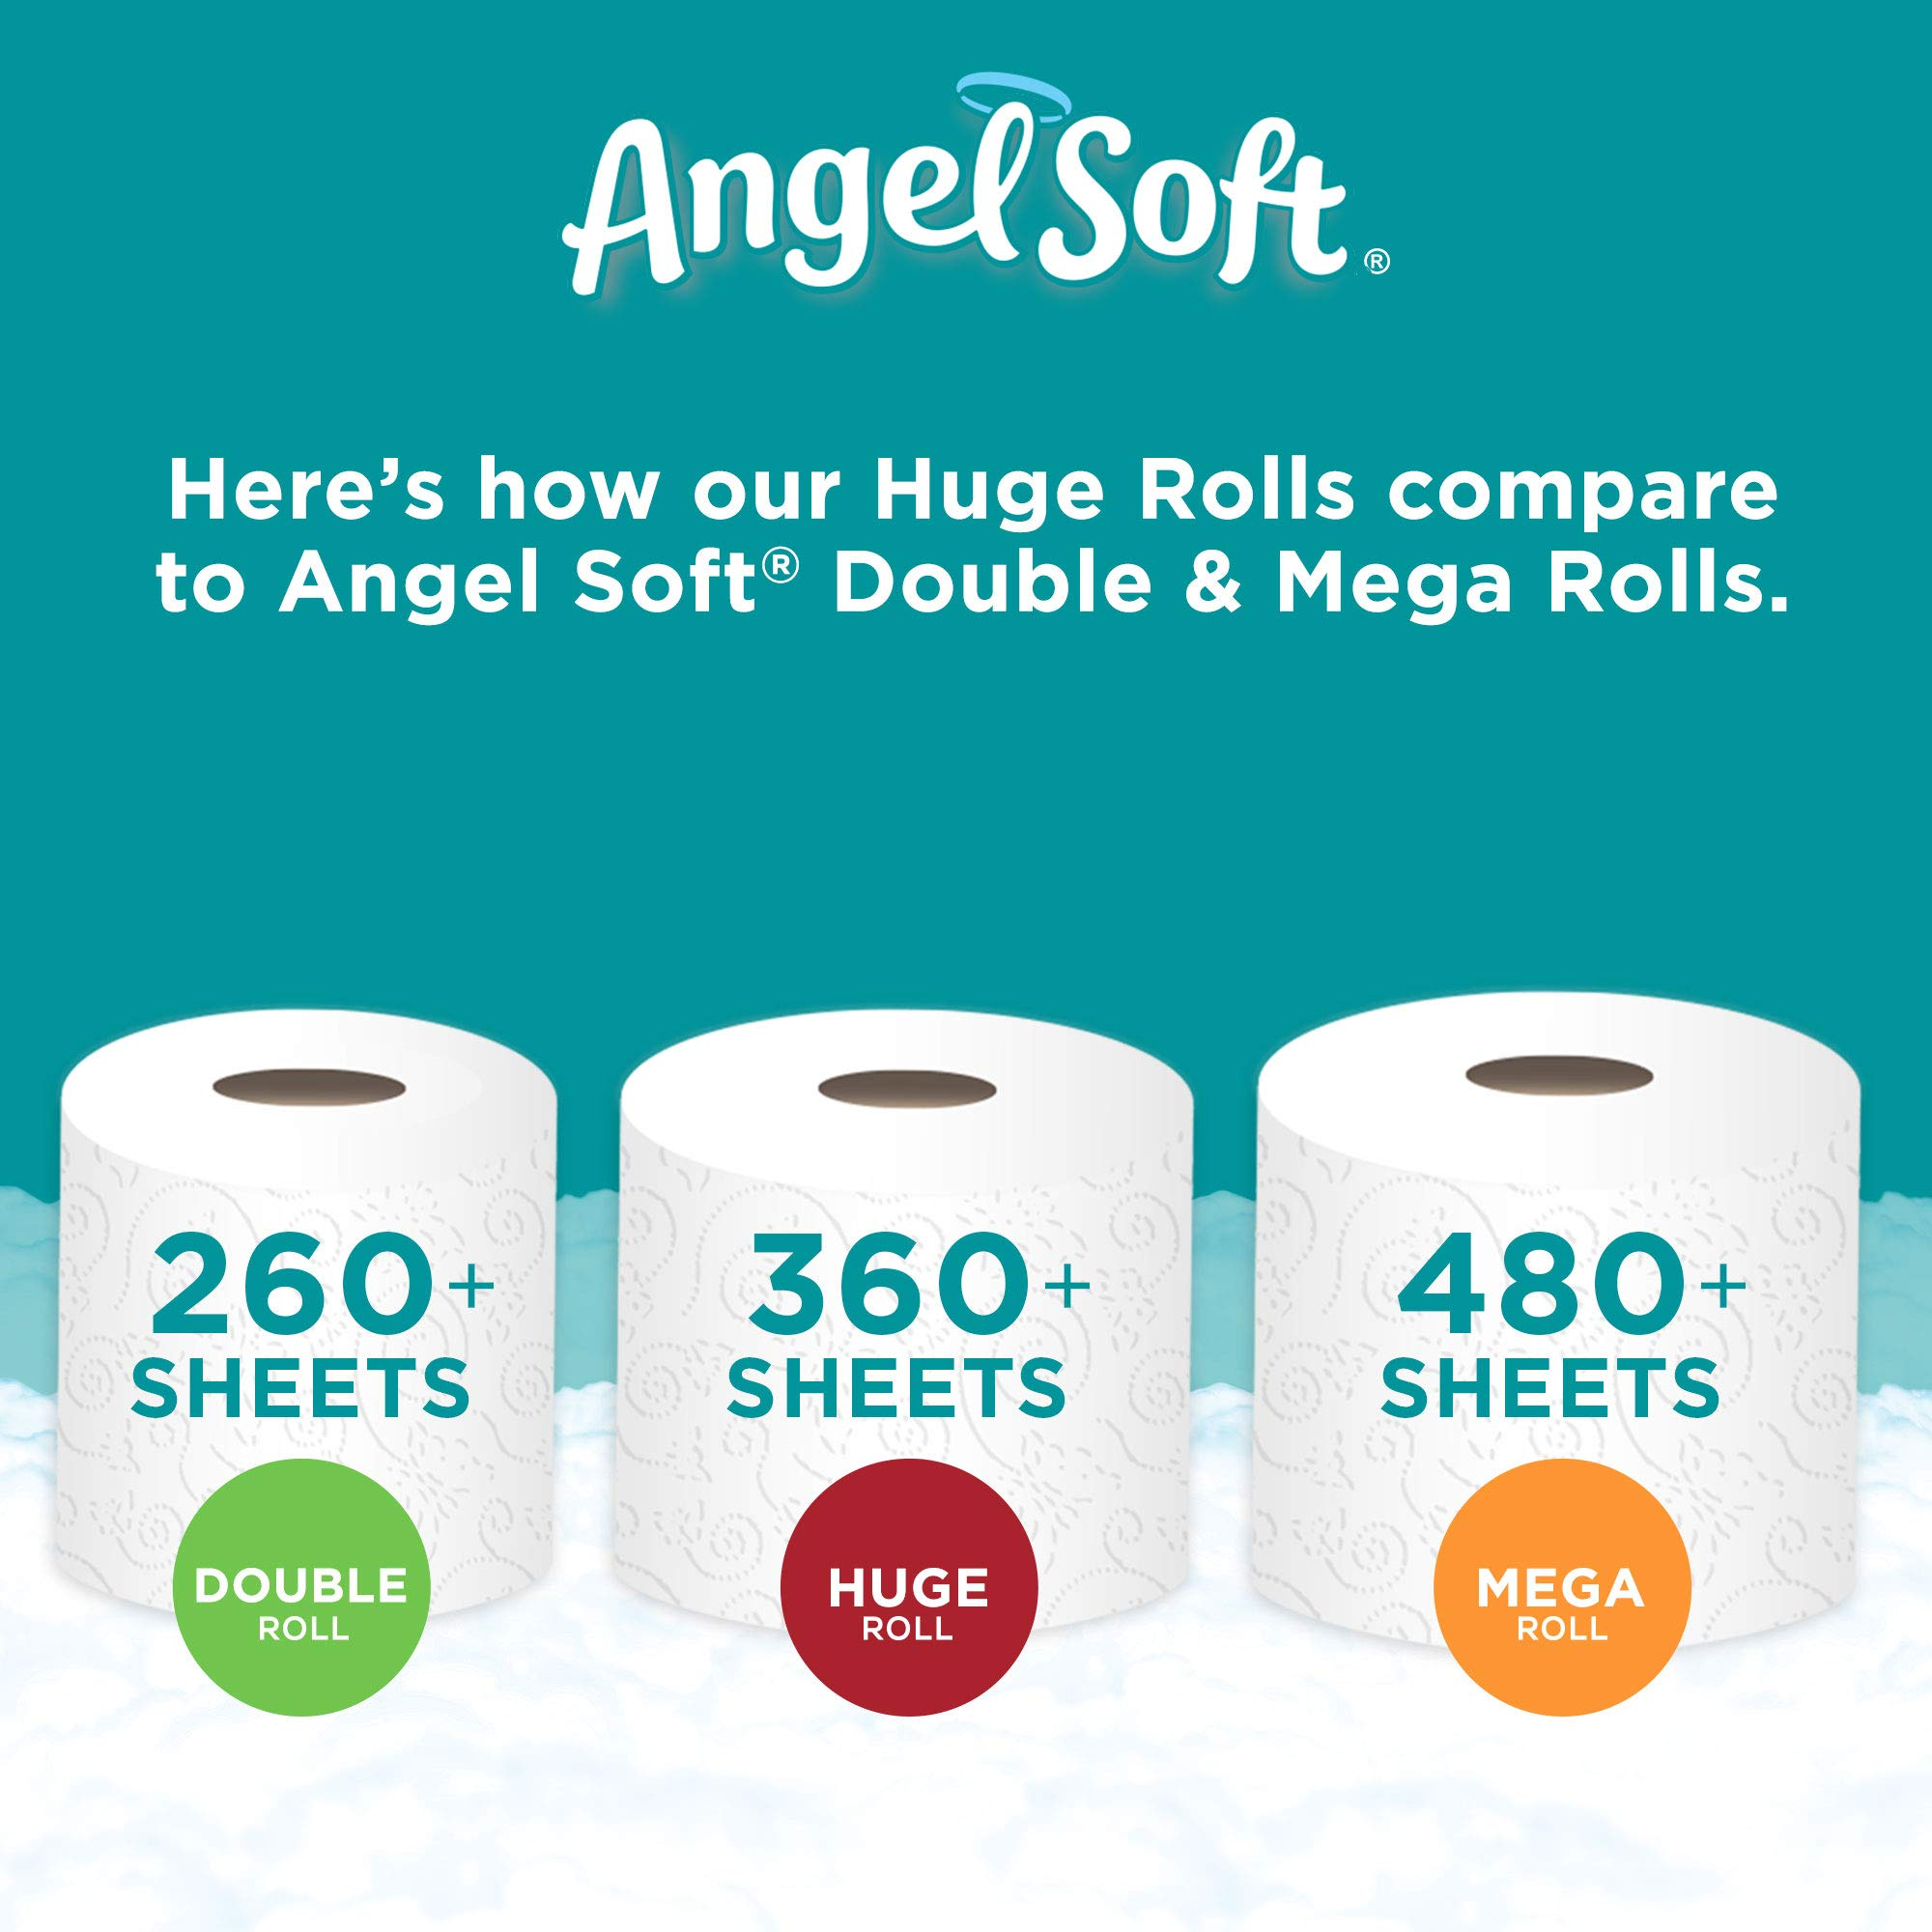 Angel Soft Toilet Paper, 36 Huge Rolls, 36 Rolls = 108 Regular Rolls, Bath Tissue by Angel Soft (Image #8)